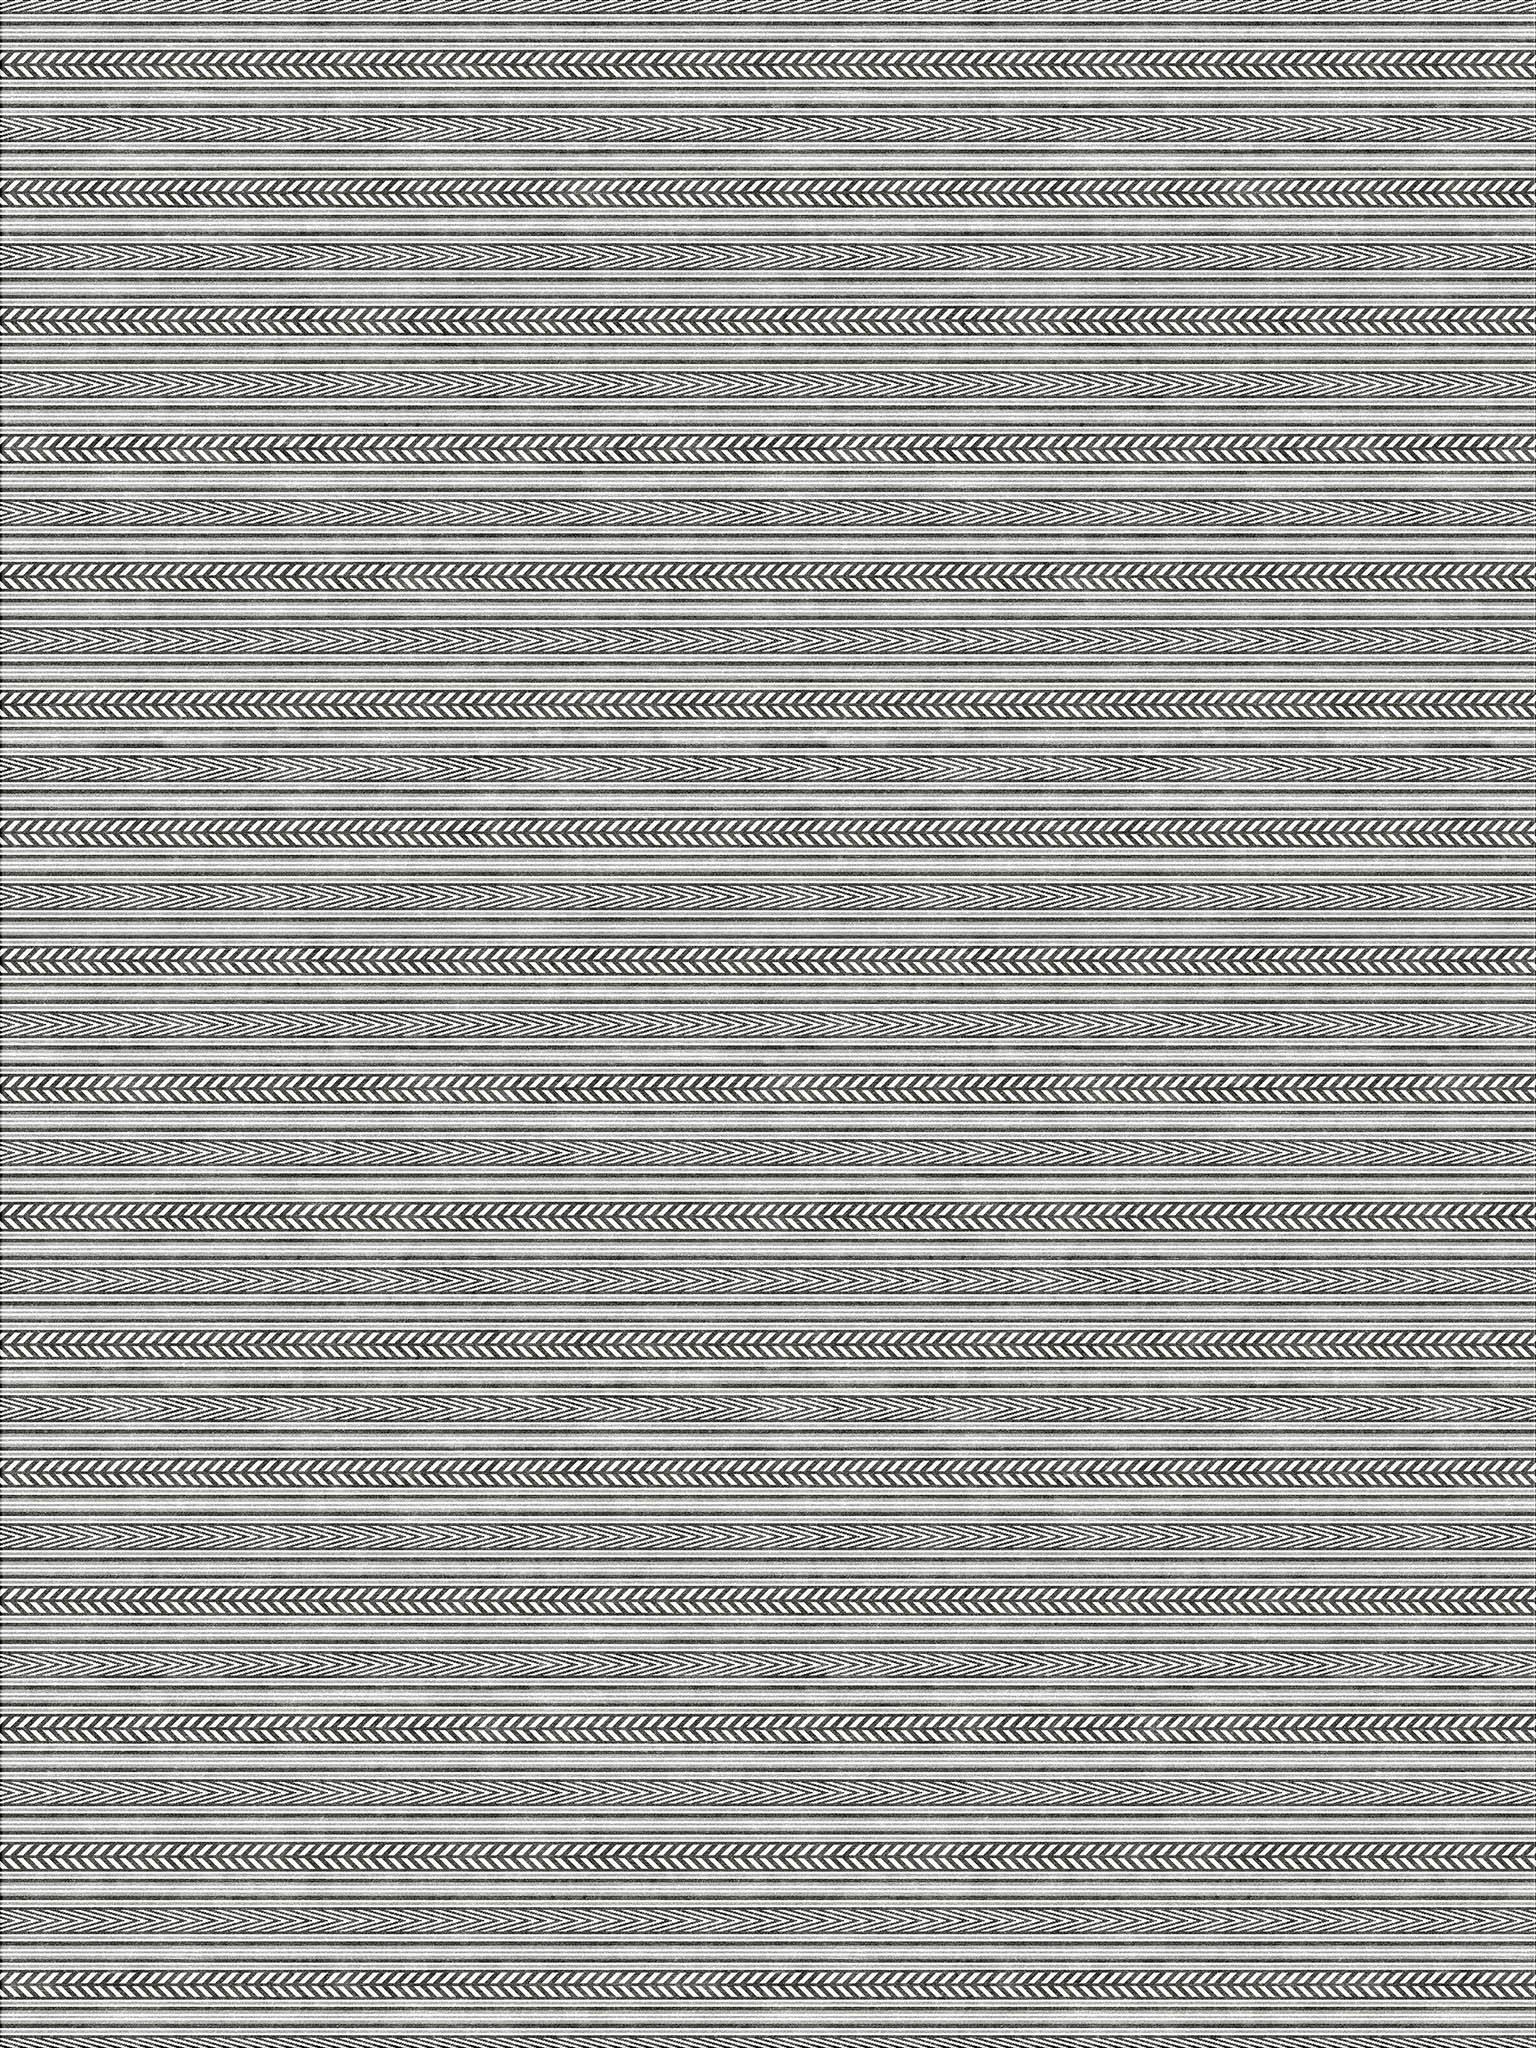 chevron alt stripe HSVHH_08_0